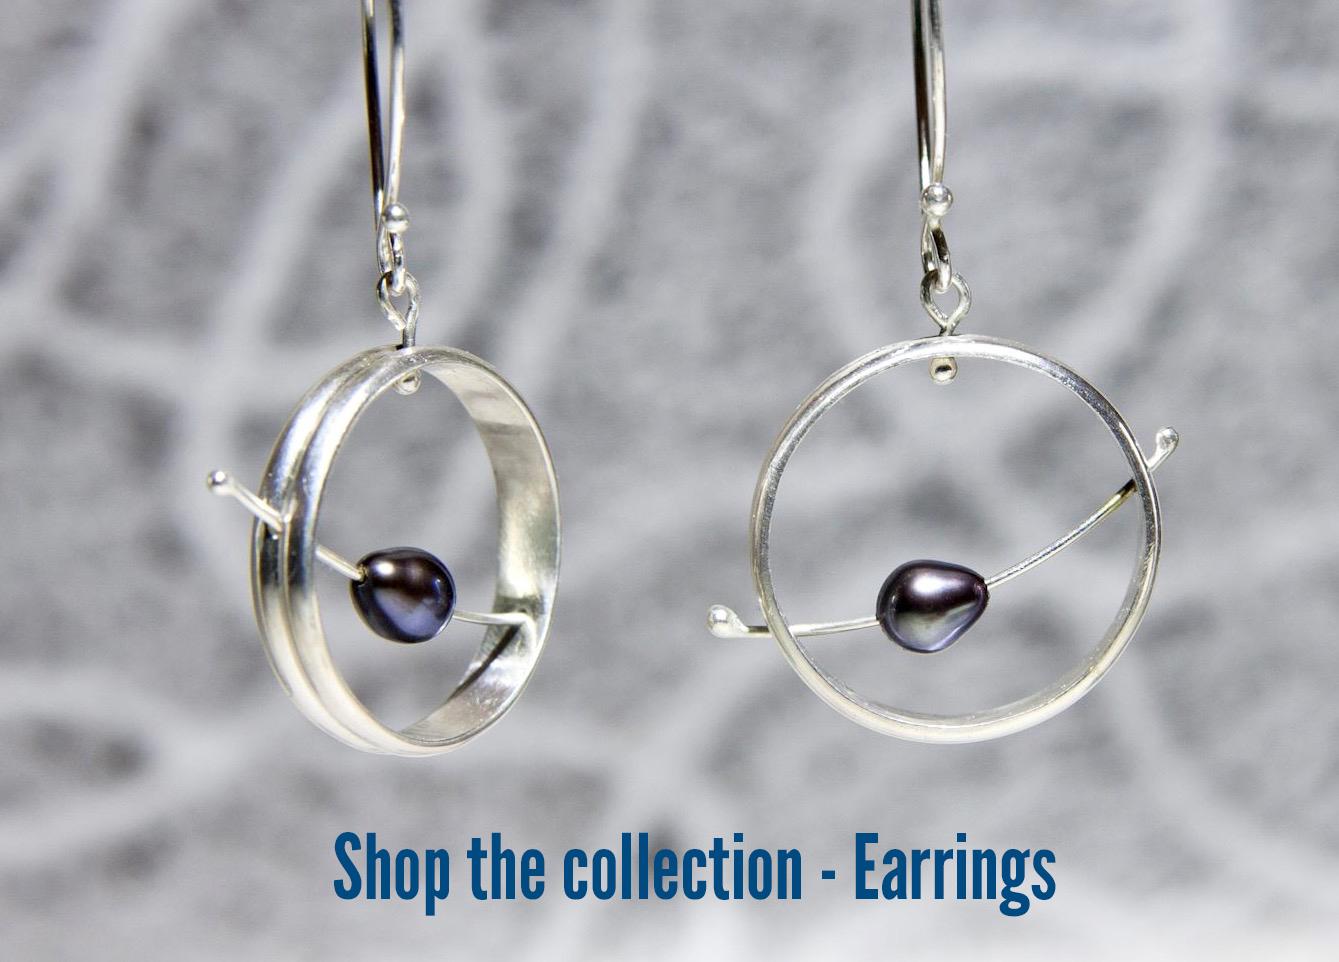 2-Silver-Pearl-Spinner-Earrings-Dana-Reed-category-image.jpg